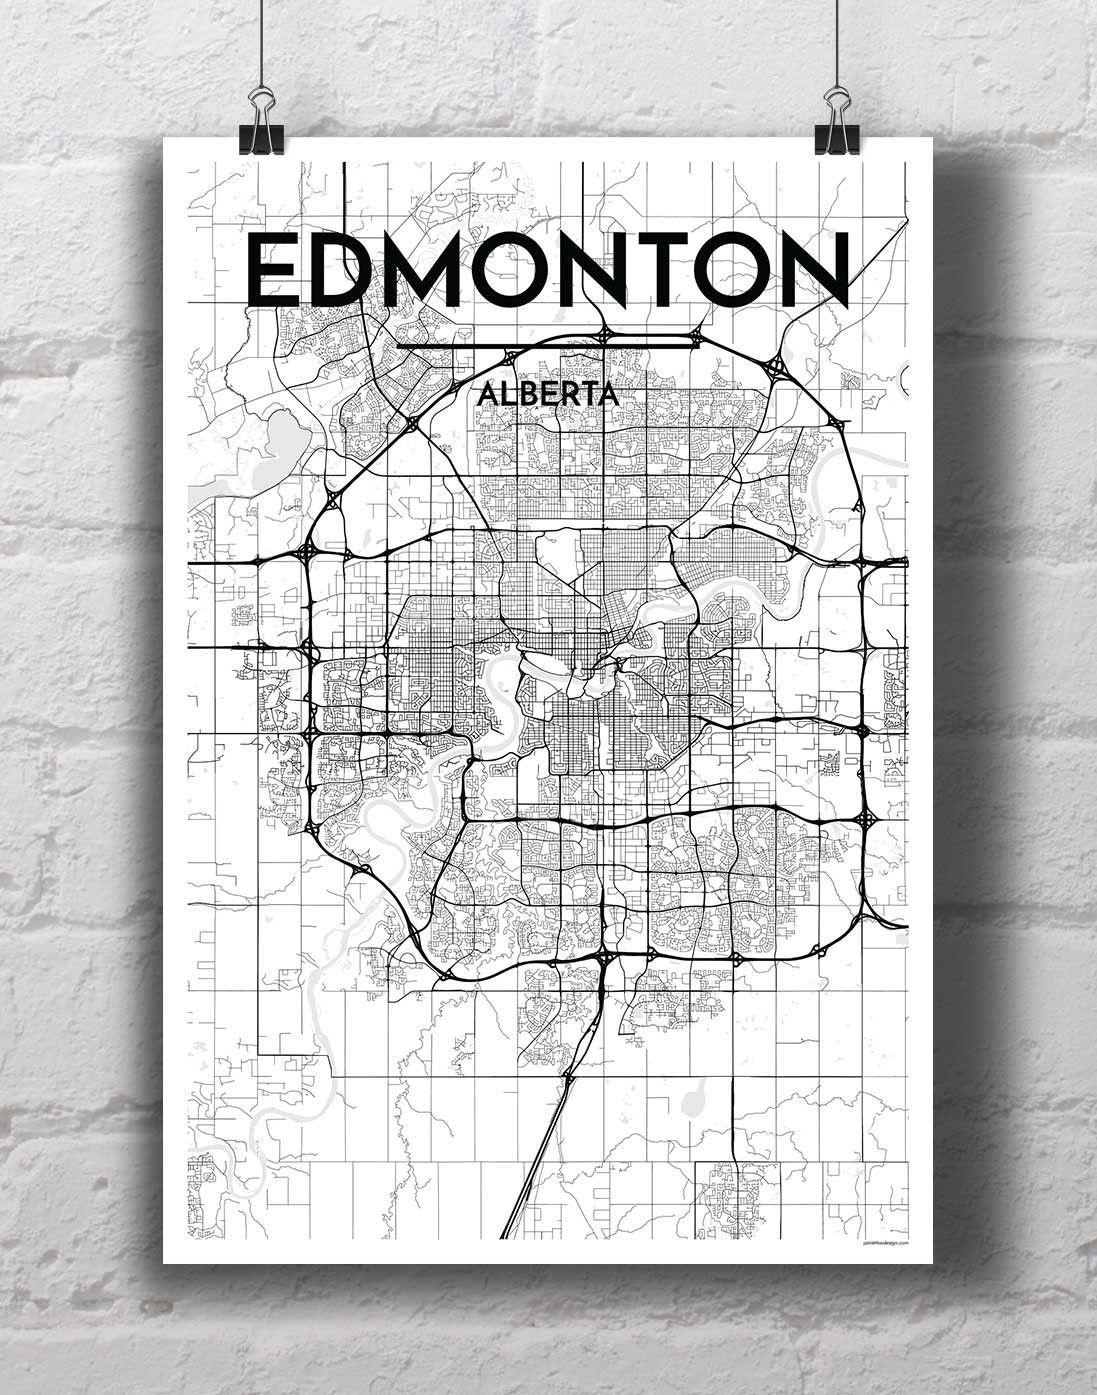 Edmonton Neighbourhoods Typography City Map Printed by Hand